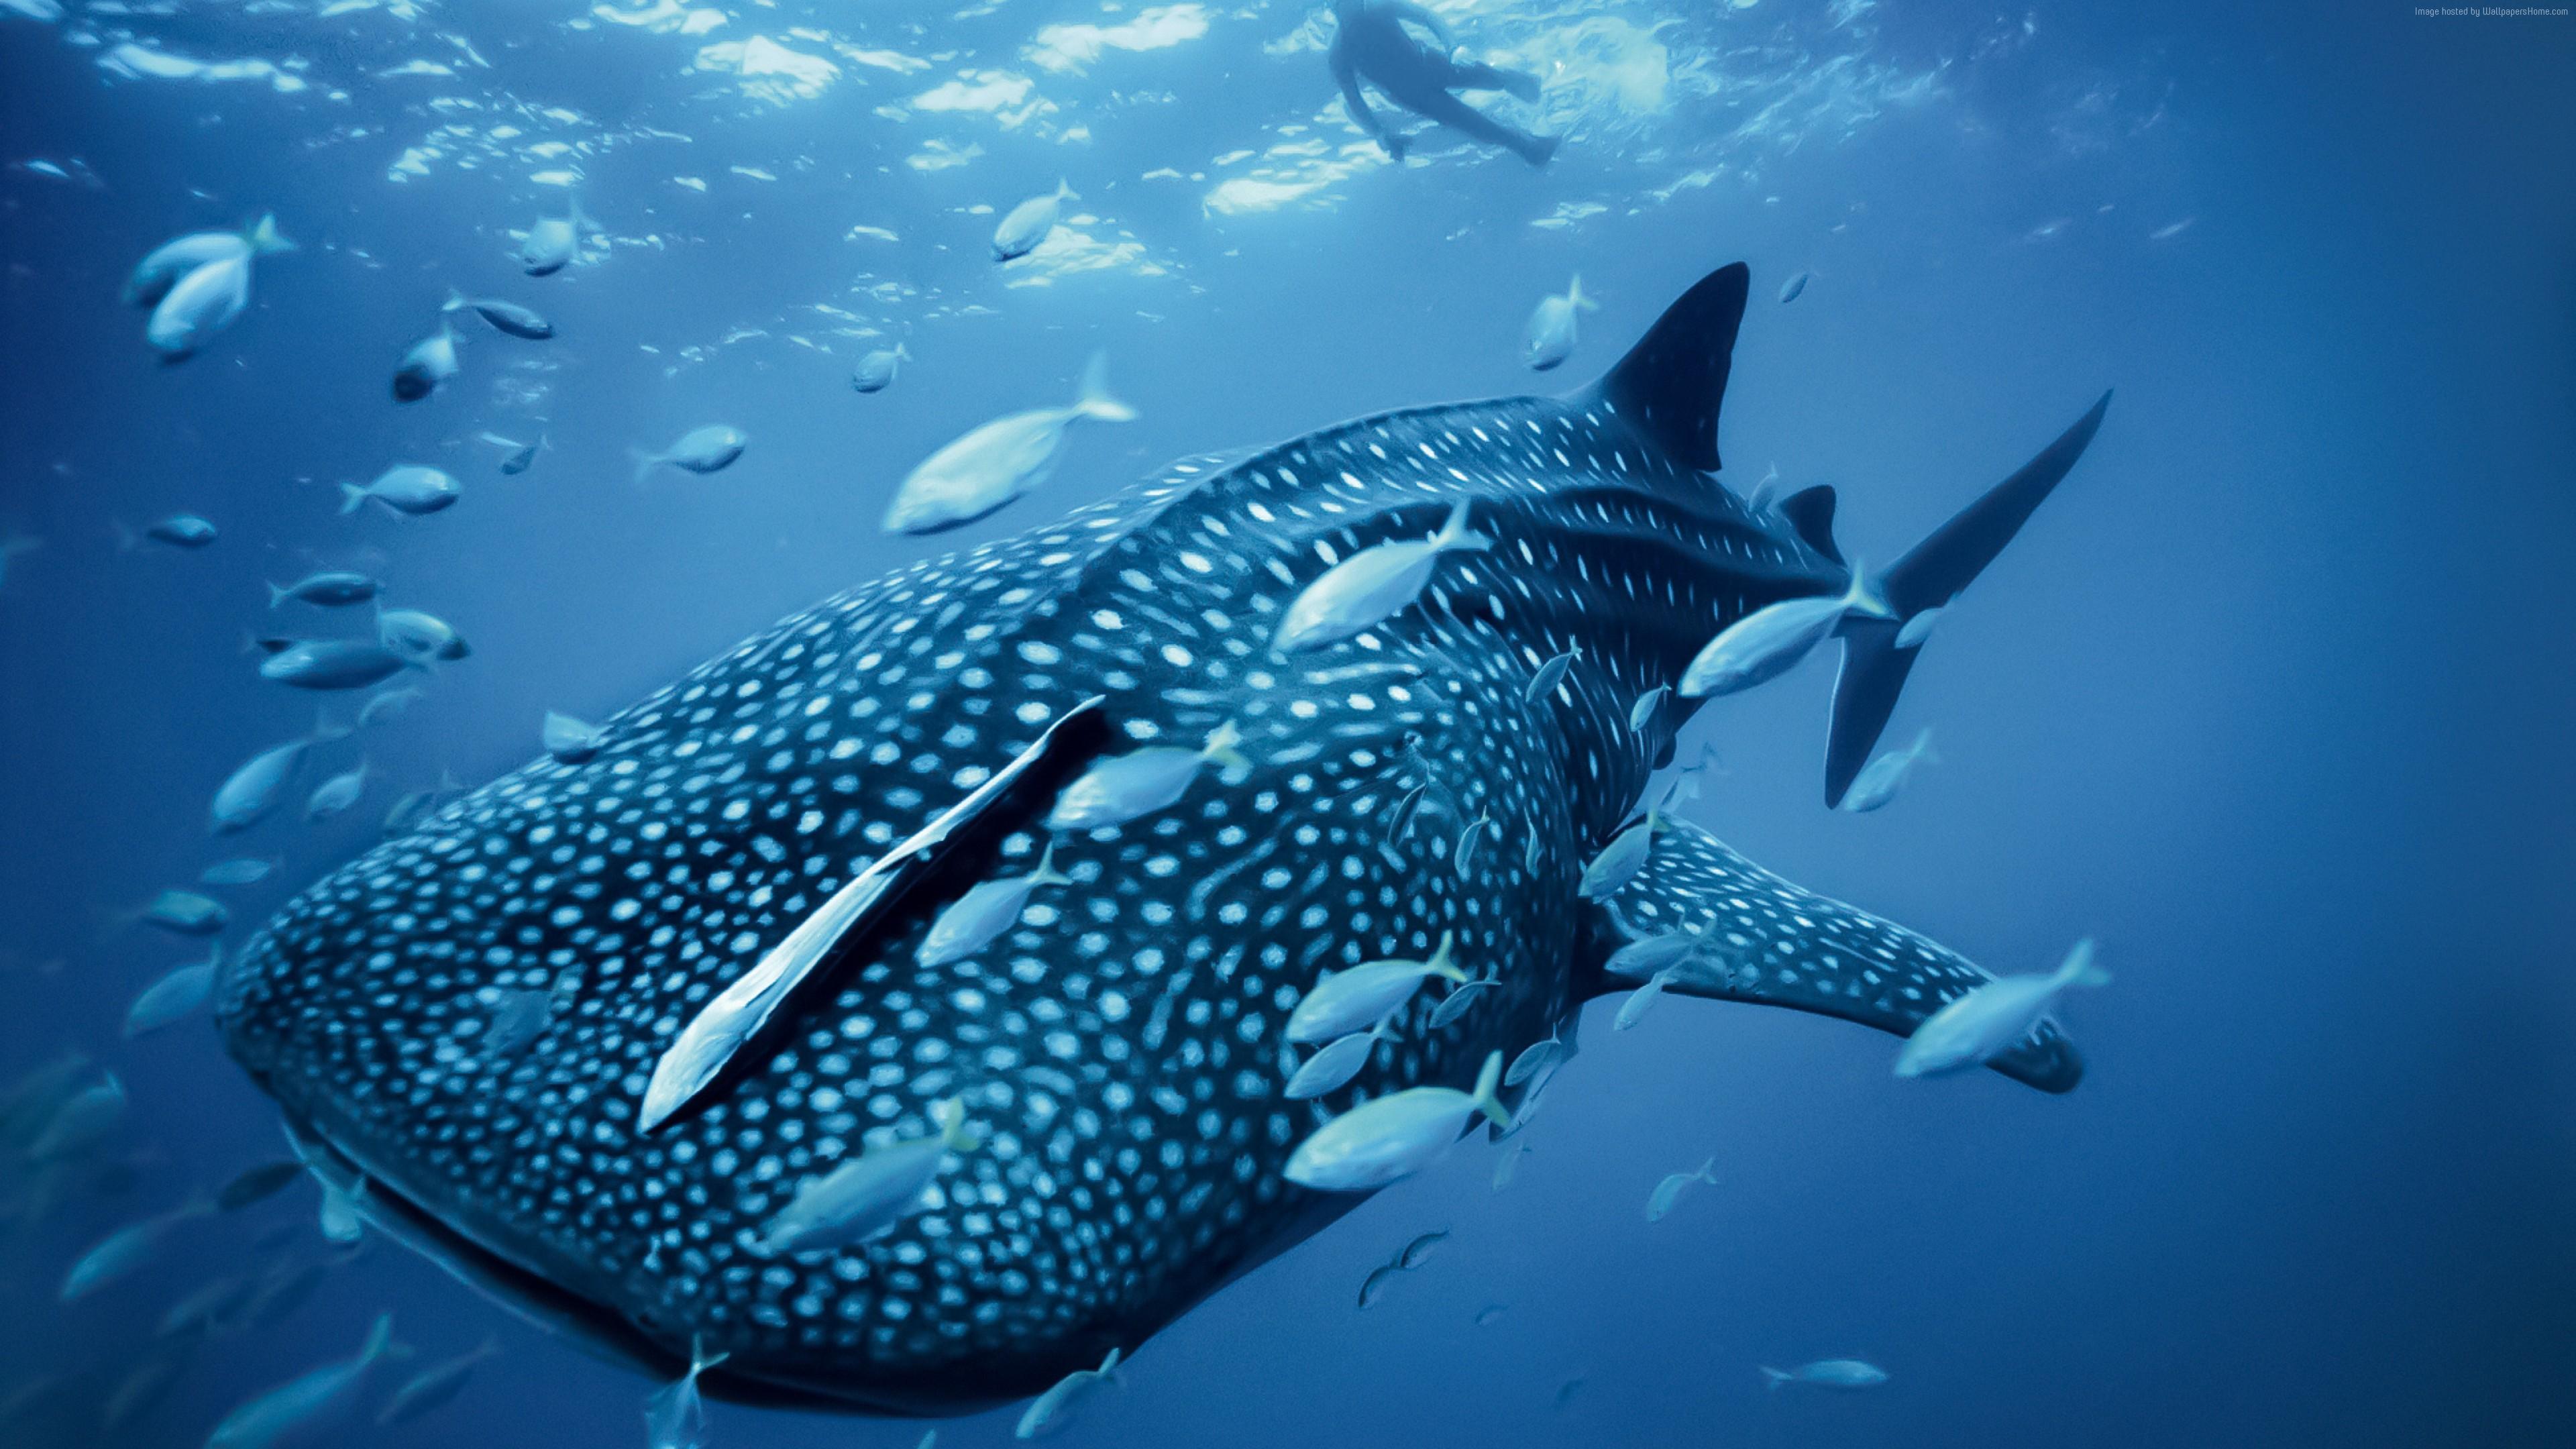 Wallpaper Whale Shark Palau Philippines Diving Tourism